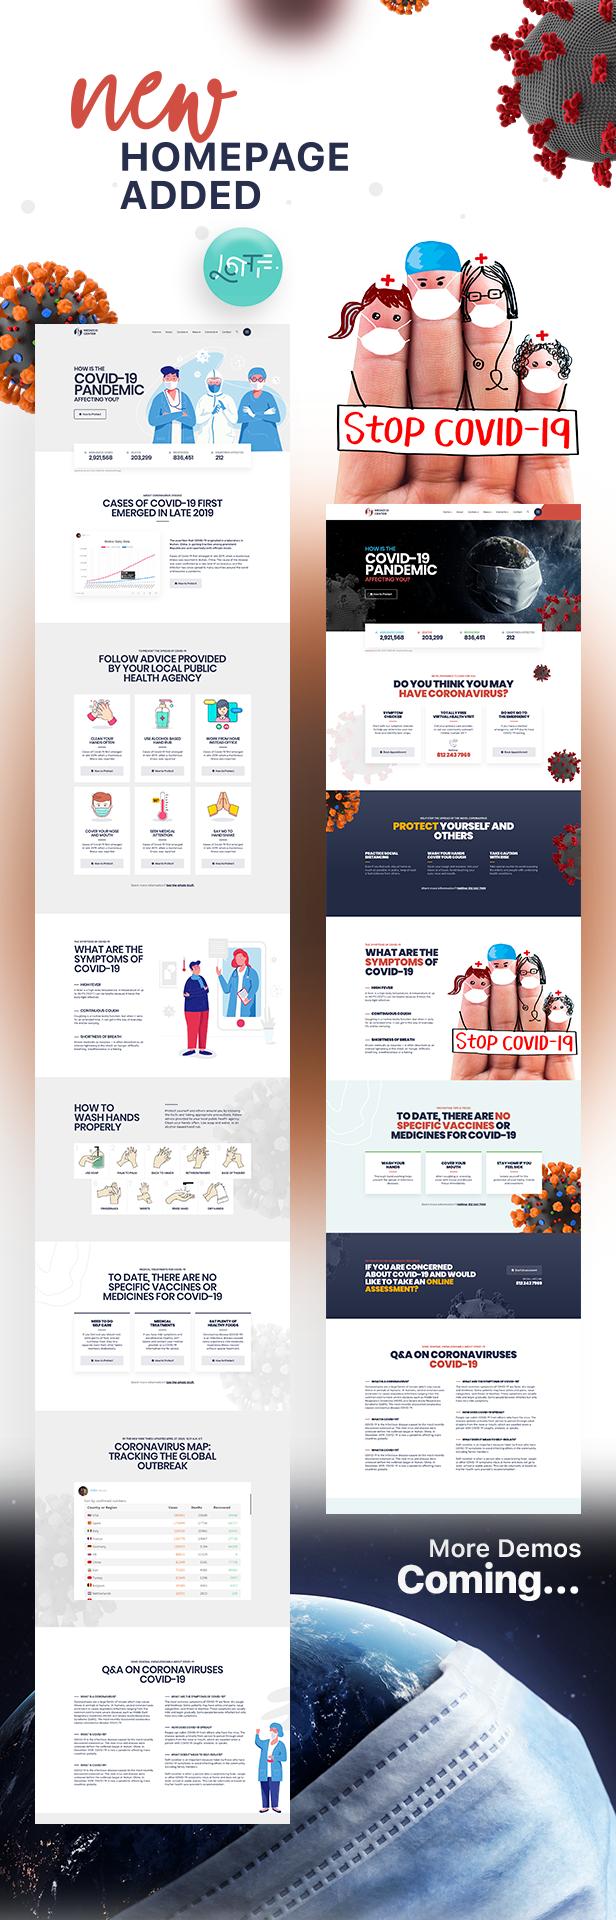 Medizco - Medical Health & Dental Care Clinic WordPress Theme Free Download #1 free download Medizco - Medical Health & Dental Care Clinic WordPress Theme Free Download #1 nulled Medizco - Medical Health & Dental Care Clinic WordPress Theme Free Download #1